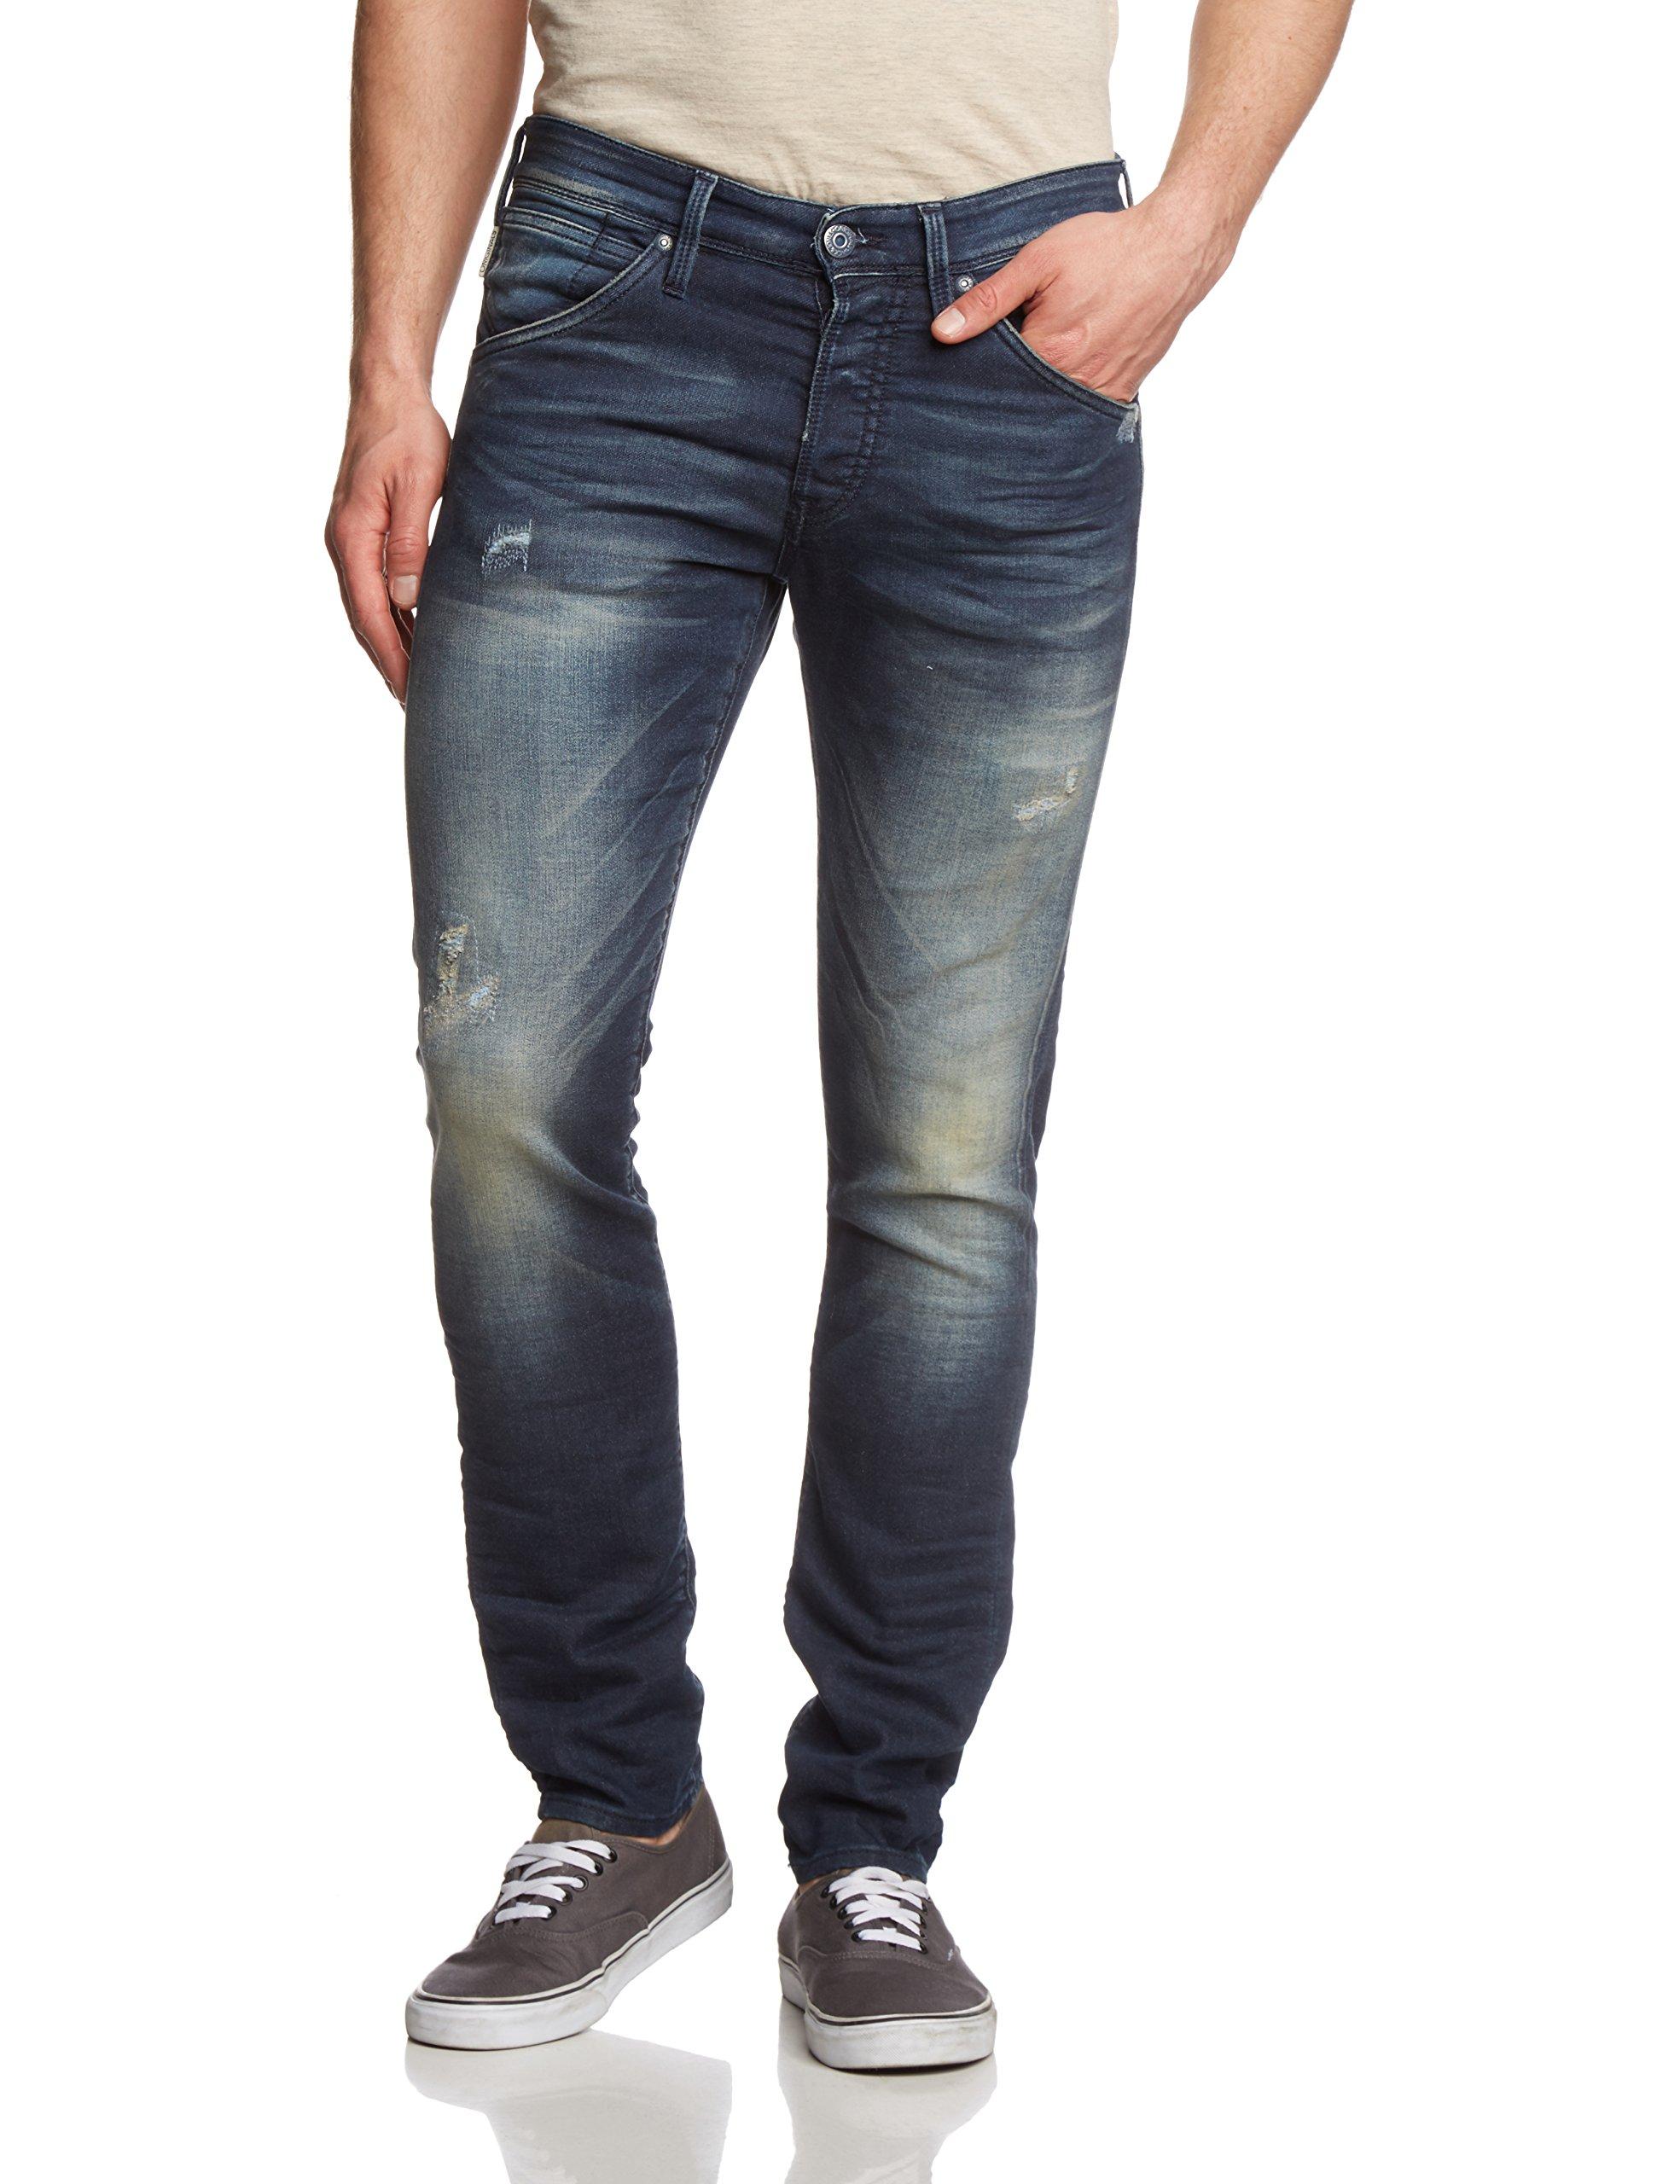 Jjfox 469 JeansBleublue Jackamp; Noos Homme Indigo FabricantW32L34 Jones Bl DenimTaille Jjiglenn Knit nX80OwPk